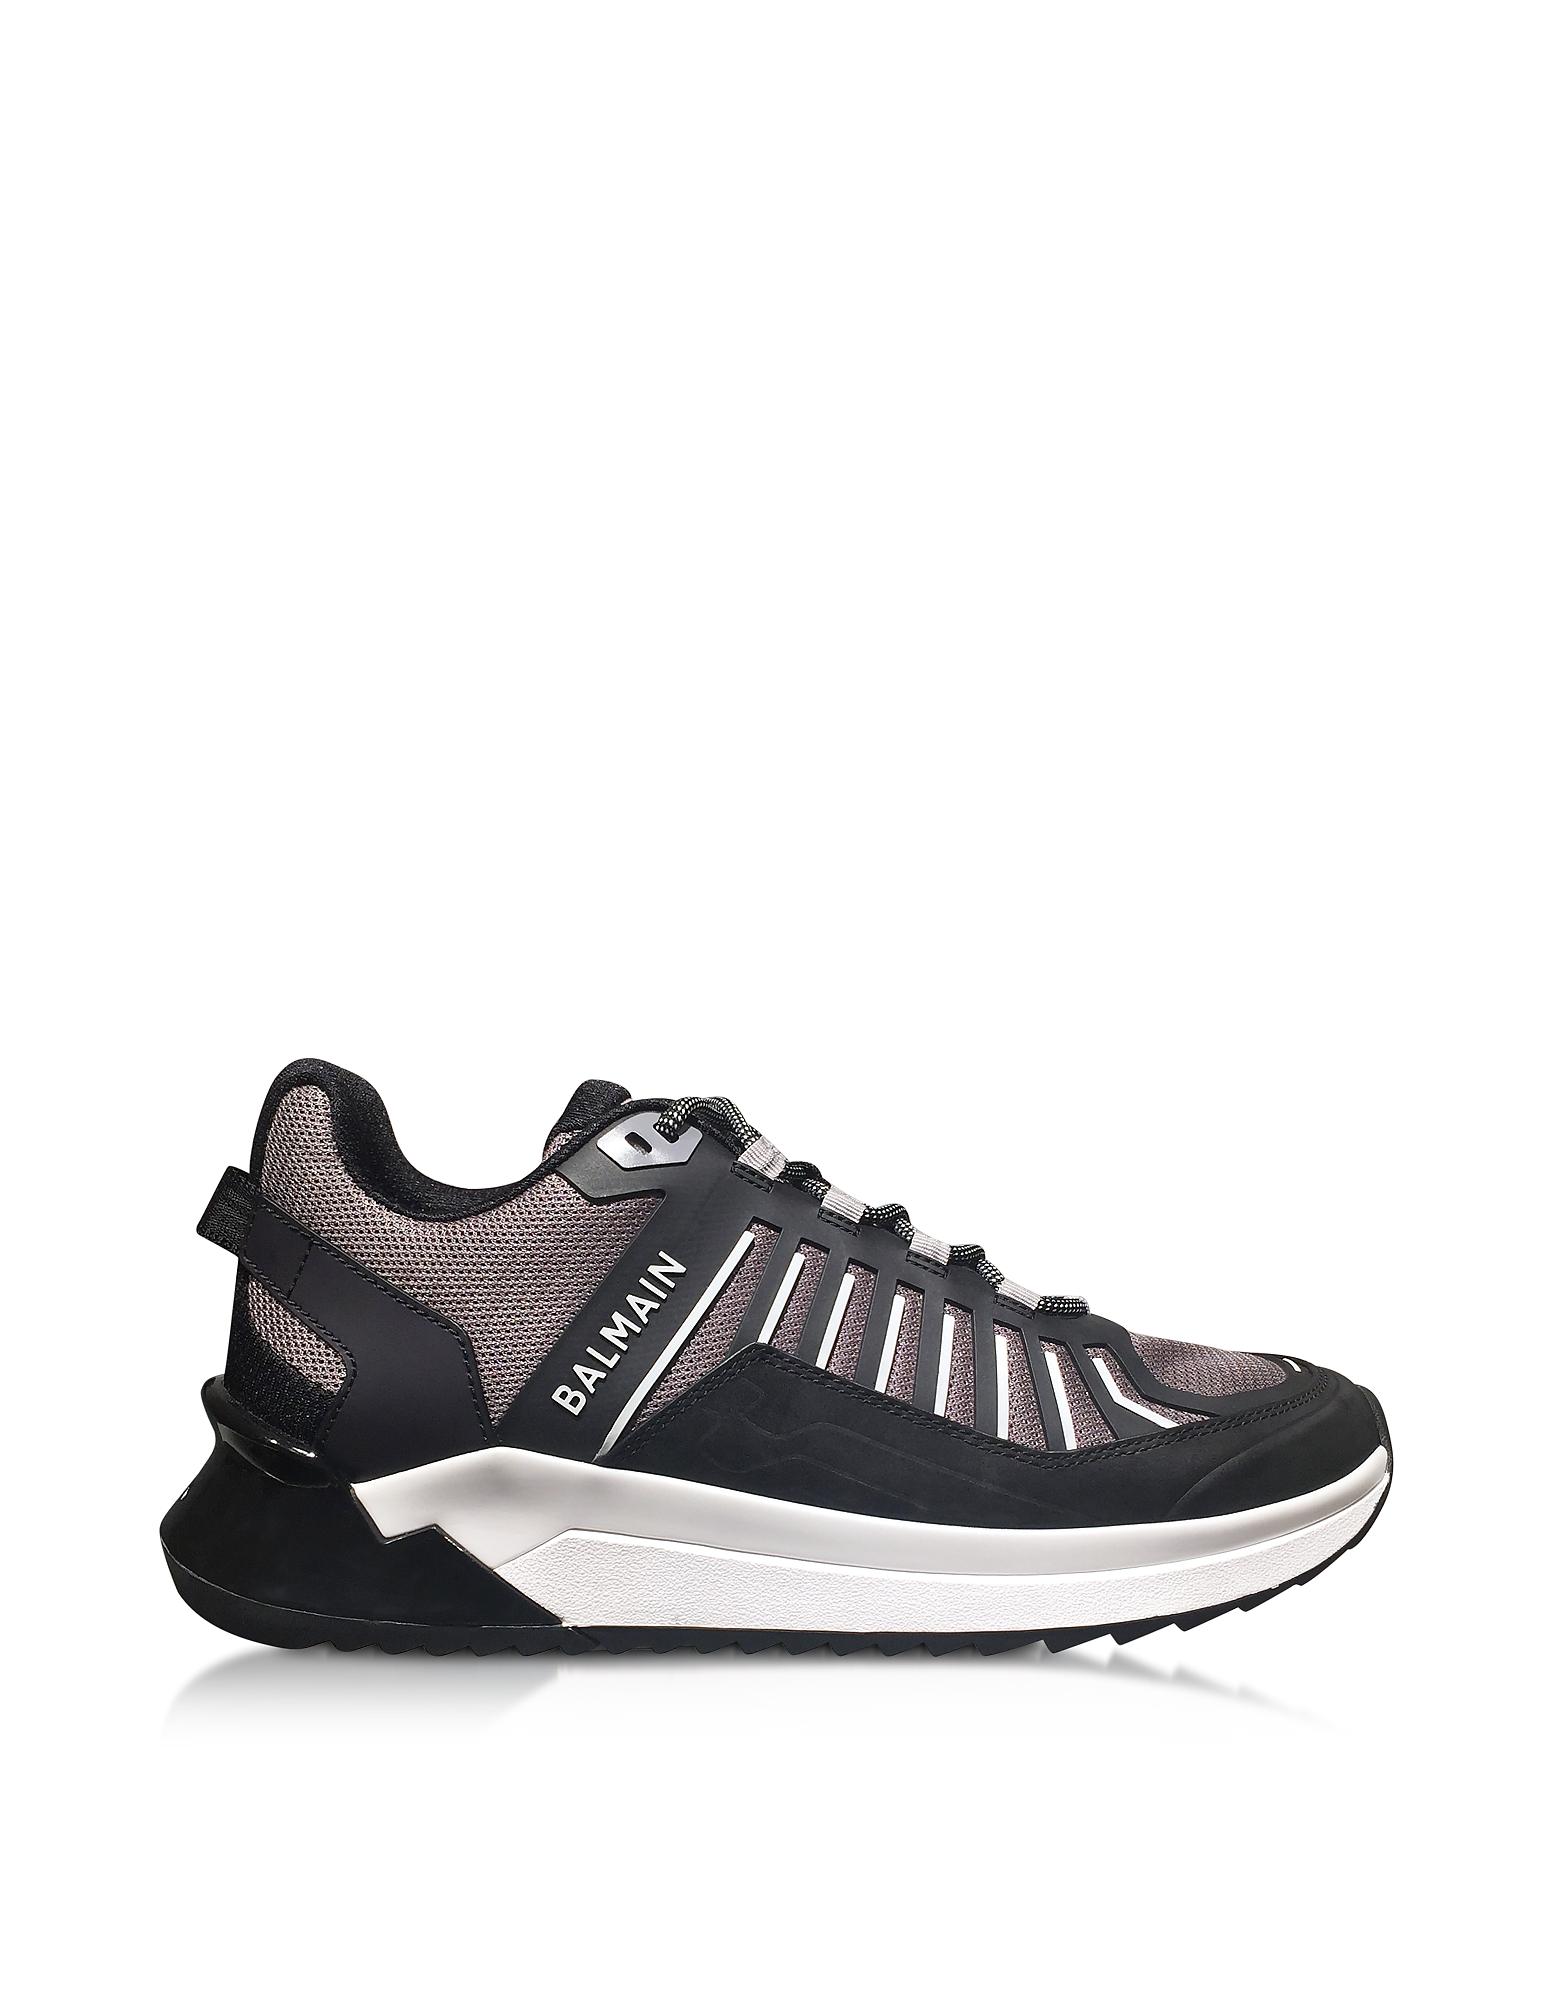 Black & Gray Low Top Men's B-Trail Sneakers